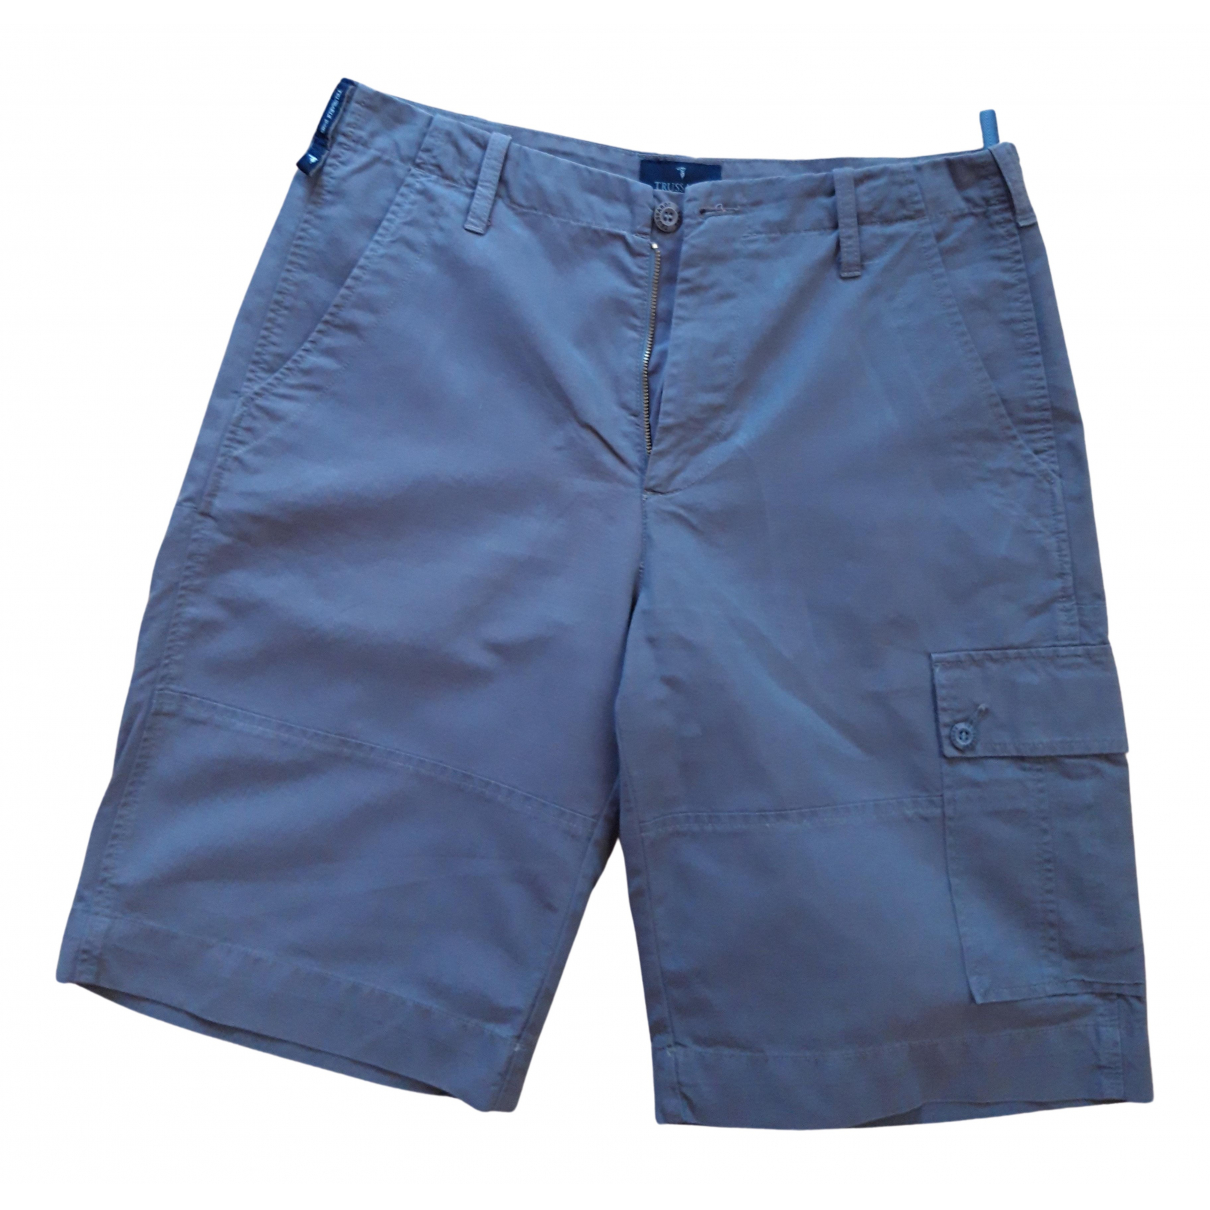 Trussardi Jeans \N Shorts in  Grau Baumwolle